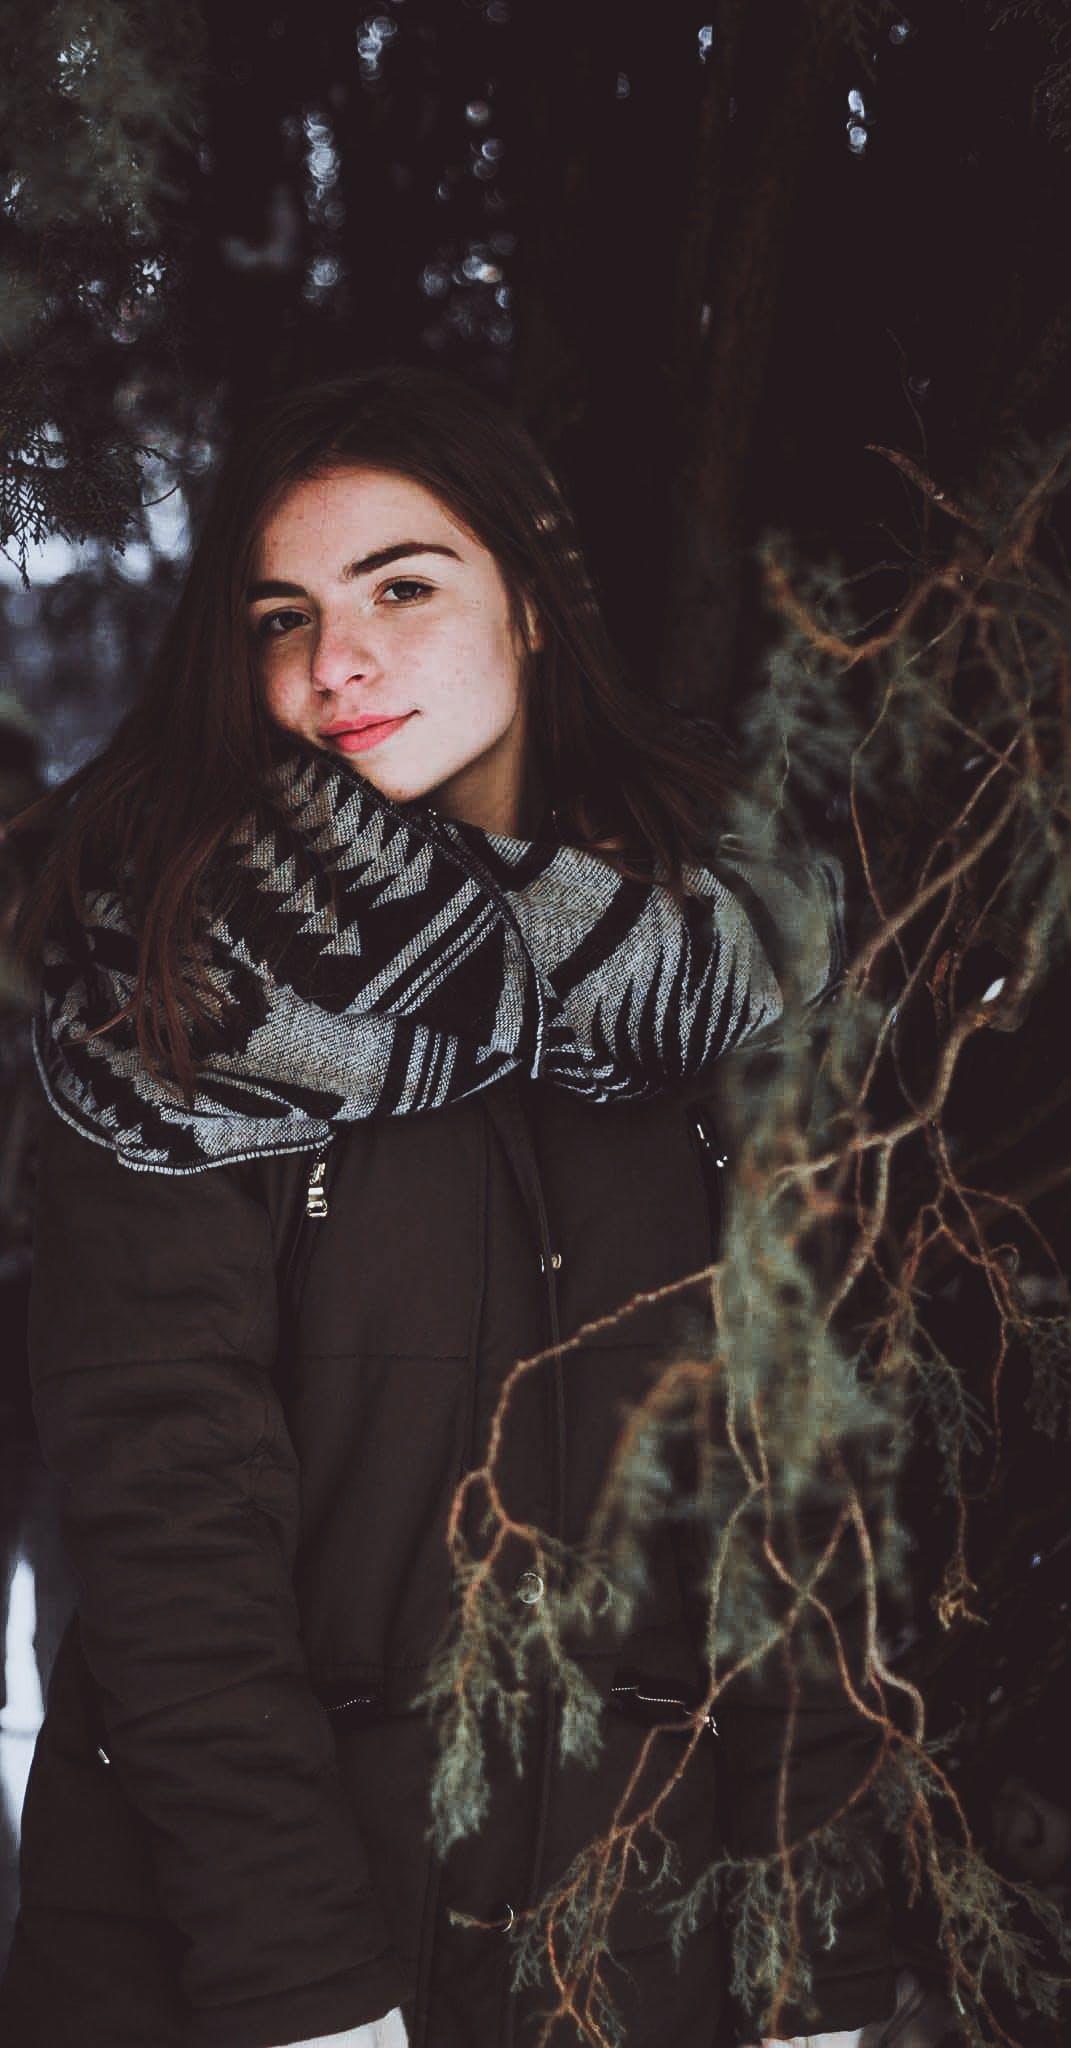 Woman Wearing Black Zip-up Jacket Posing Under Tree